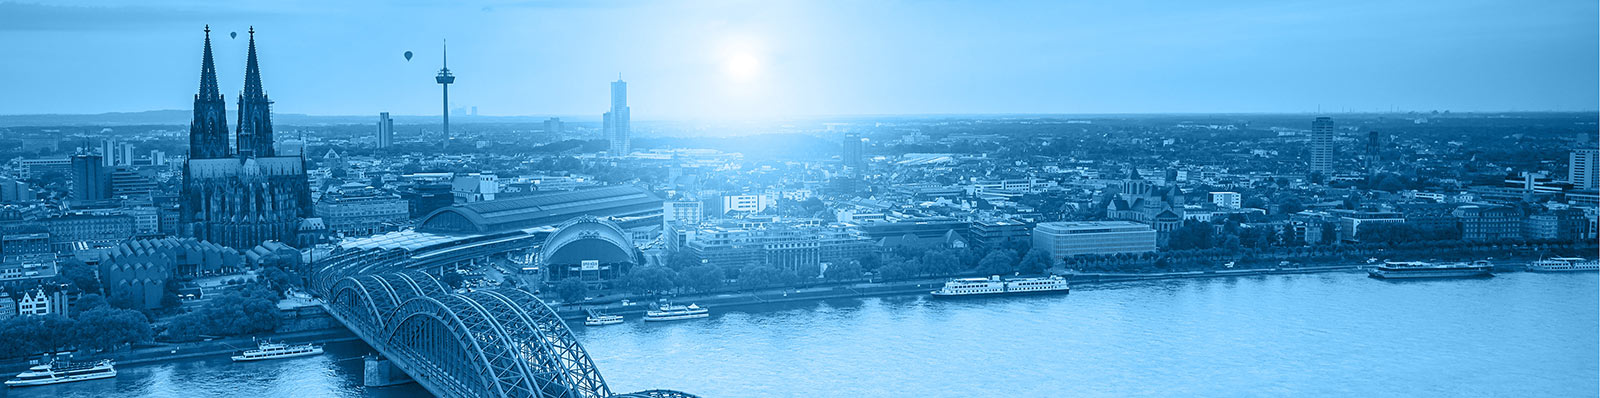 Willkommen in Köln